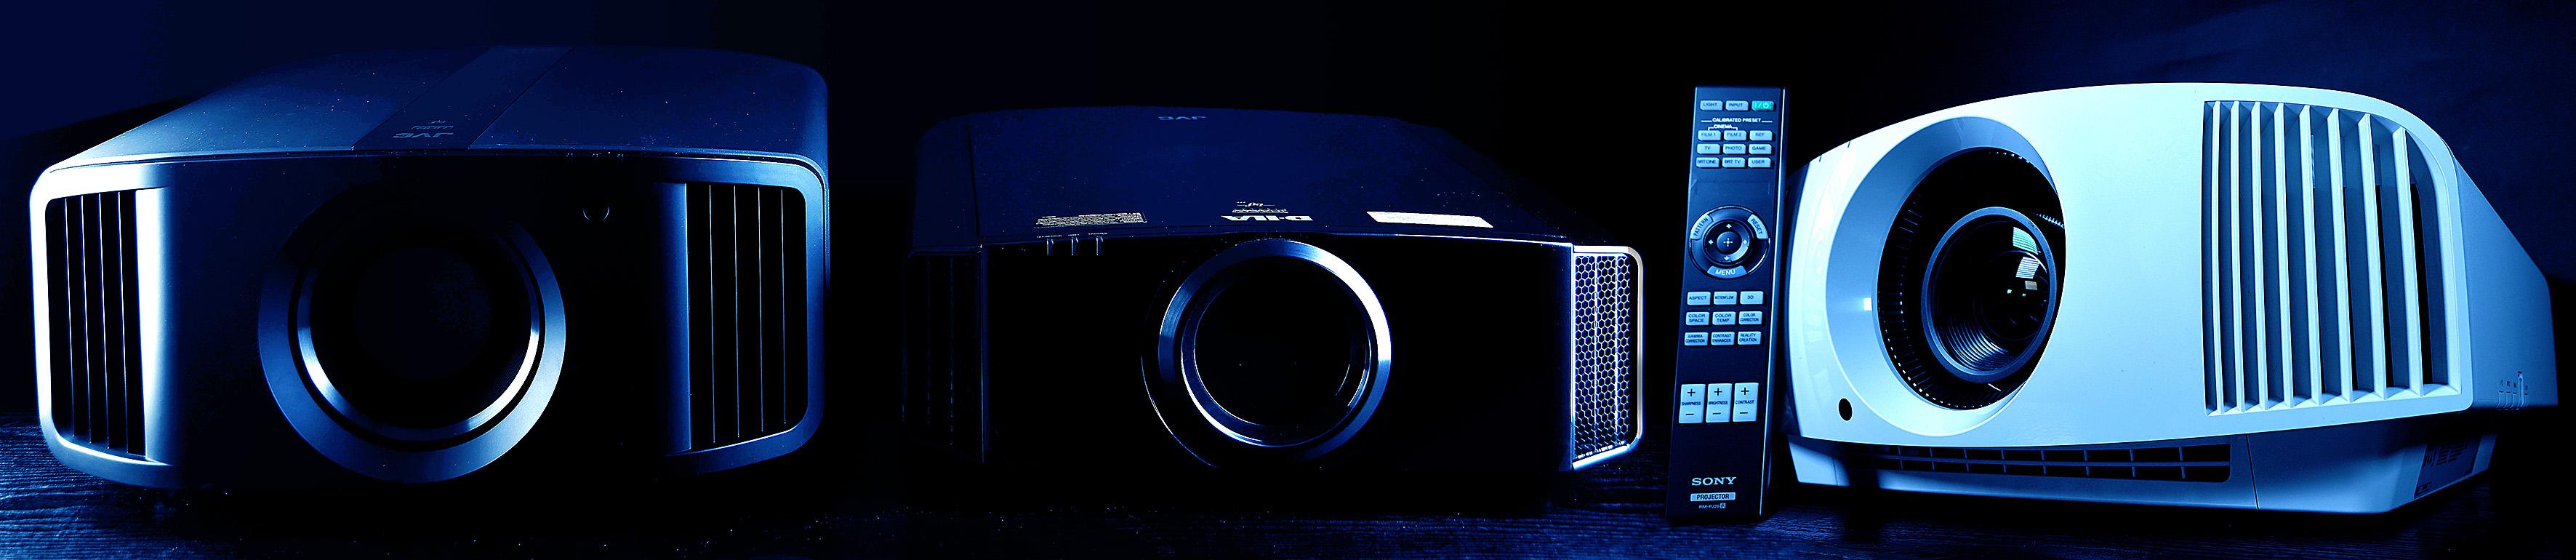 Foto: Michael B. Rehders - Von links: JVC DLA-N7, JVC DLA-X7900, Sony VPL-VW270